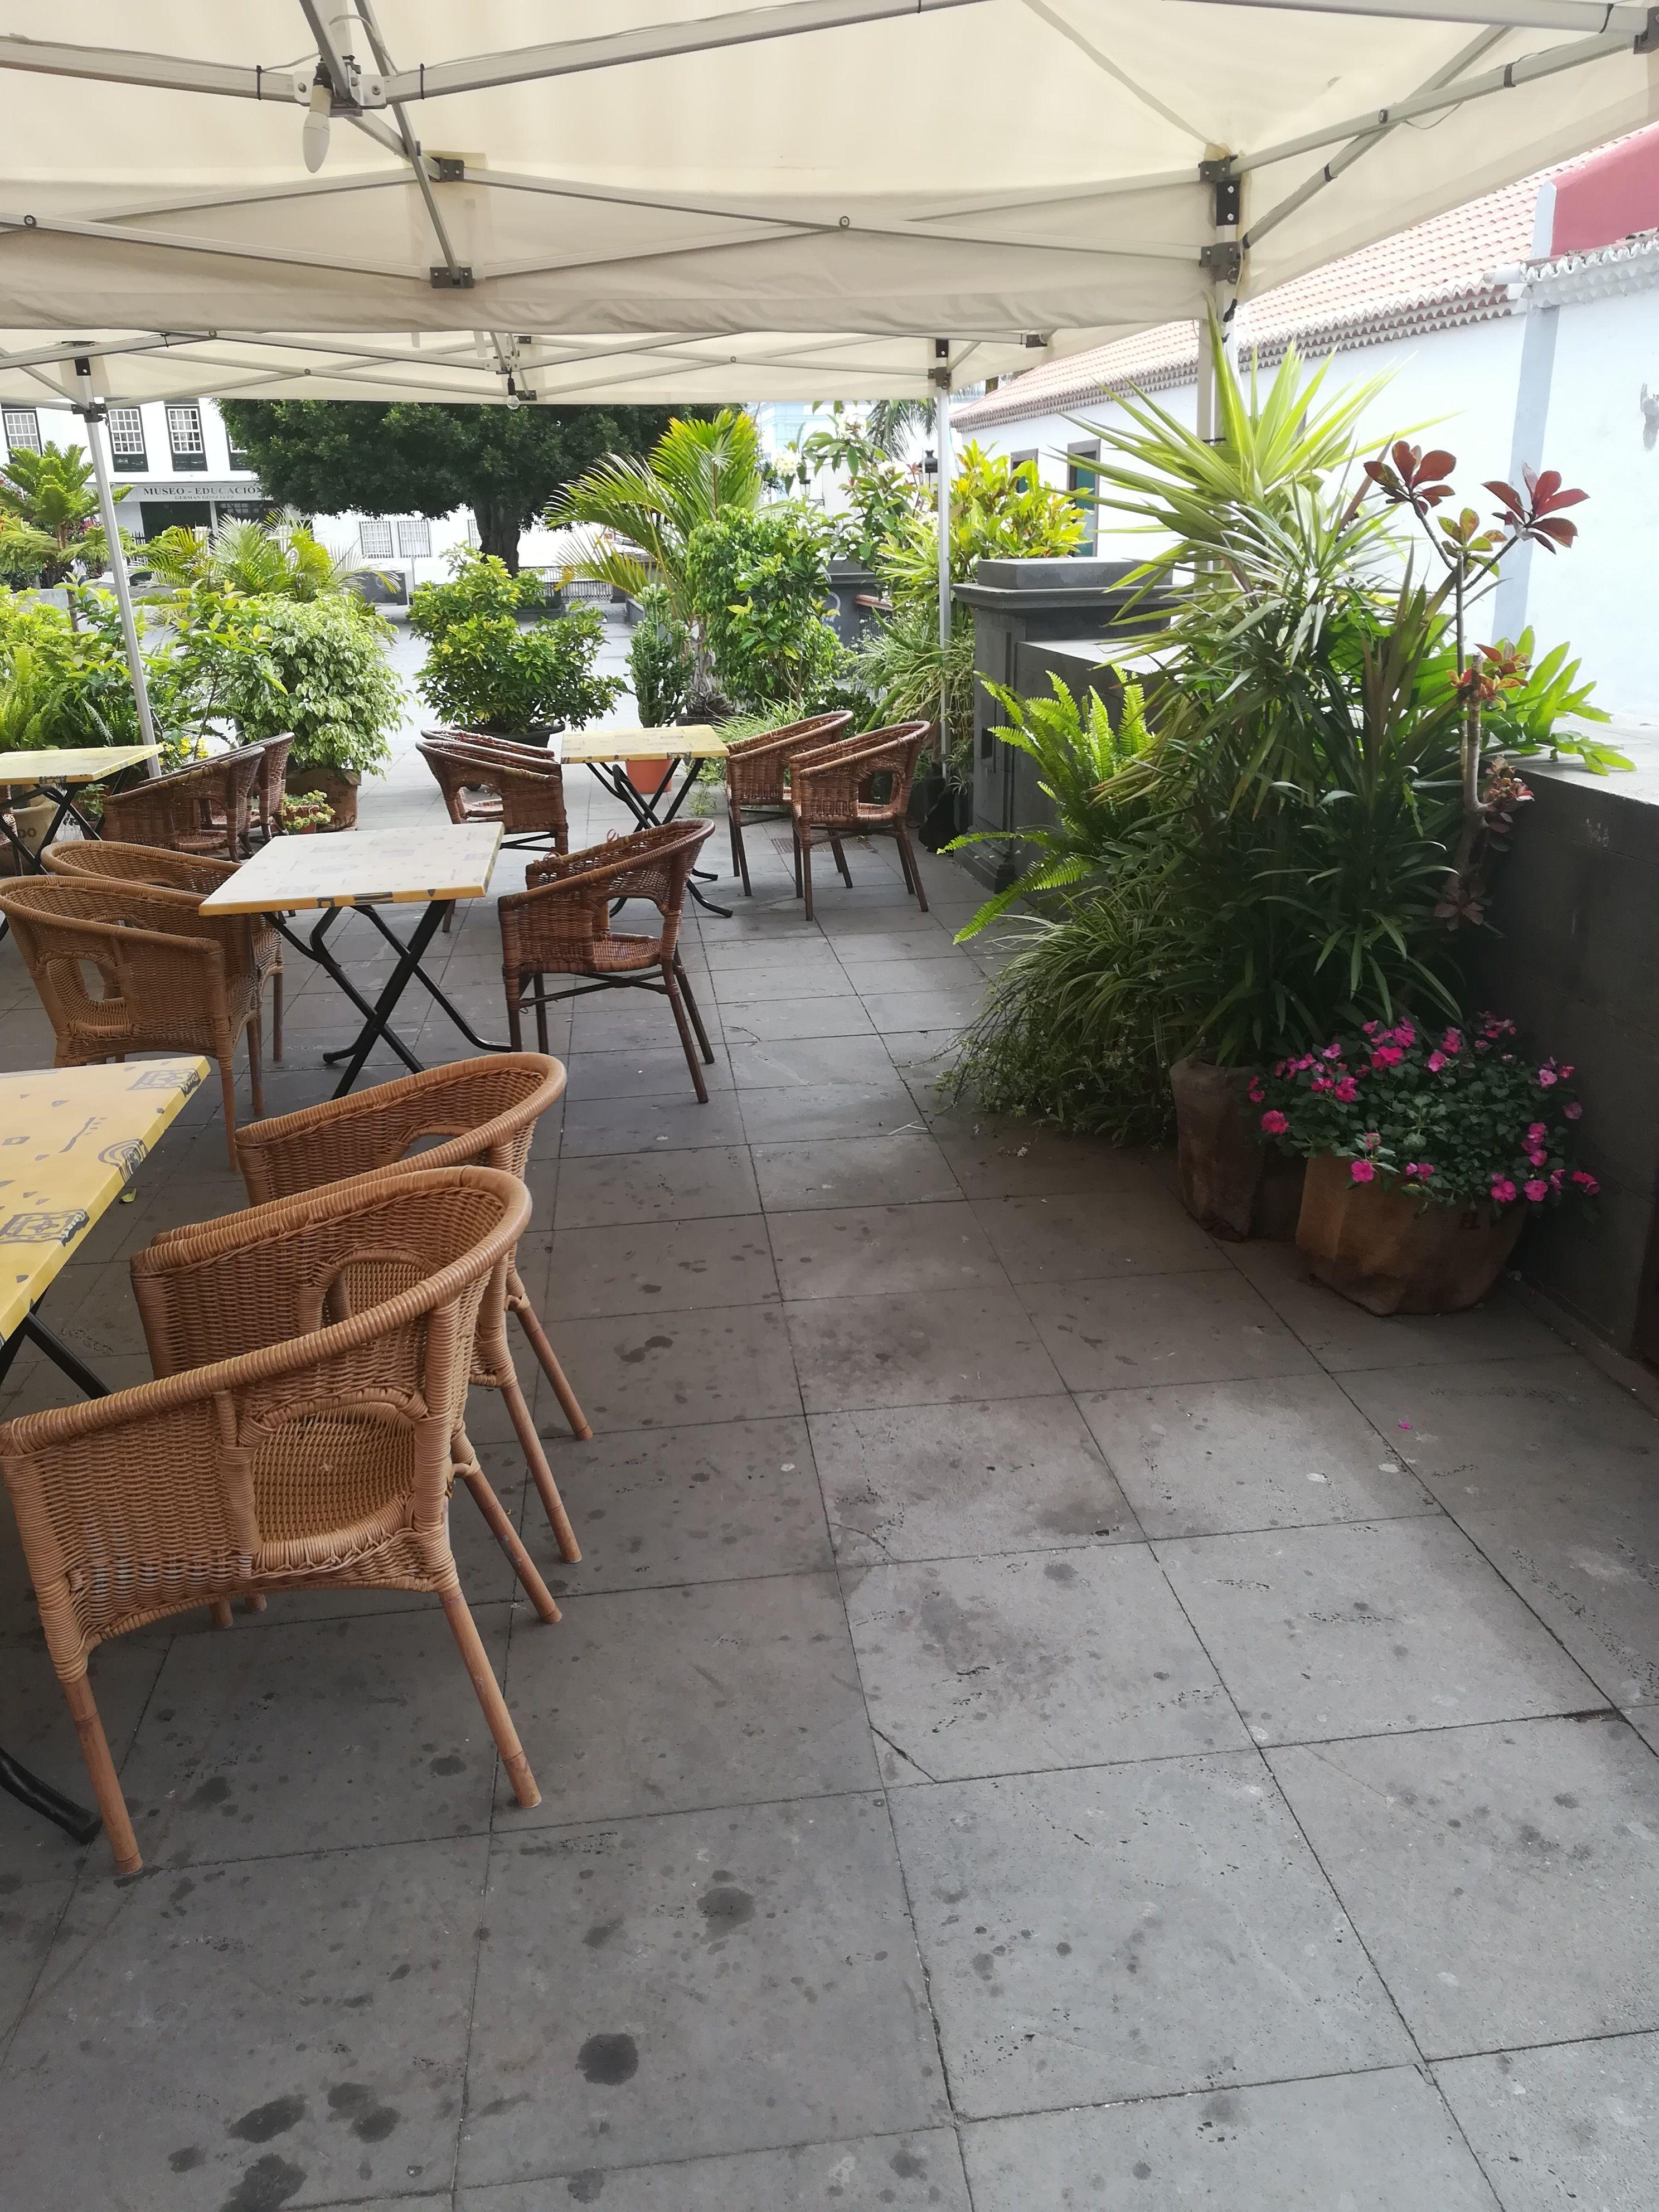 Recommended restaurants in Santa Cruz de La Palma